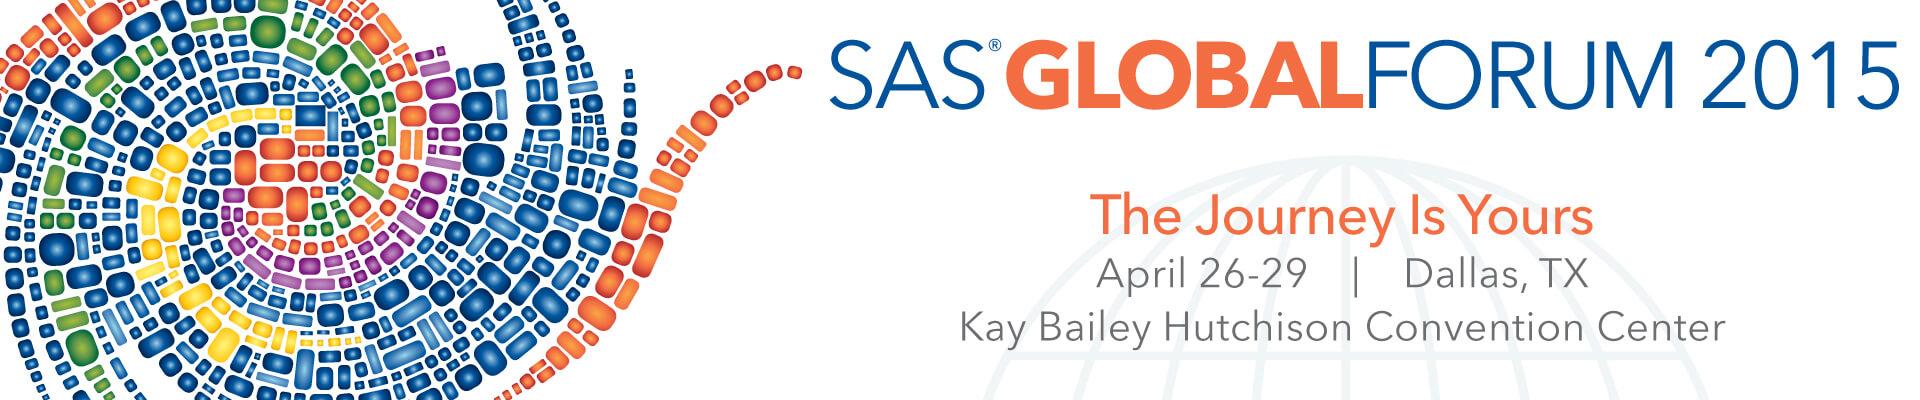 SAS Global Forum 2015 – Day One